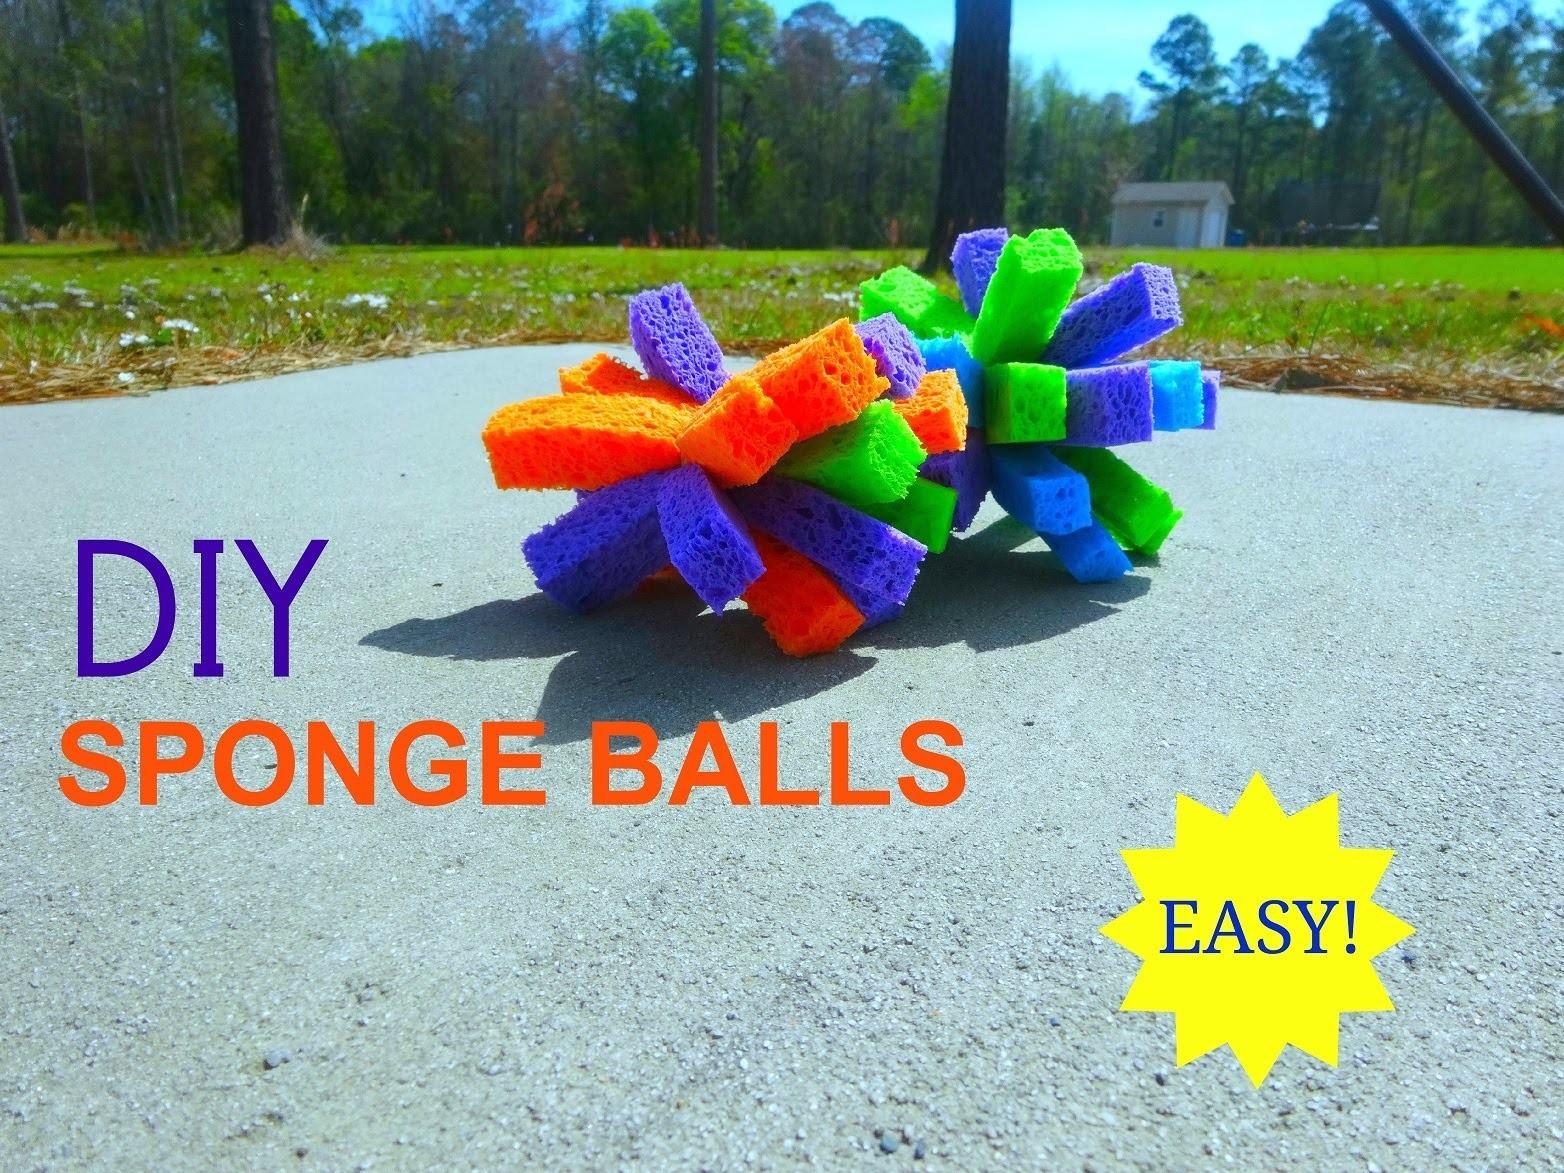 DIY Sponge Balls - Easy, Inexpensive, and Fun!